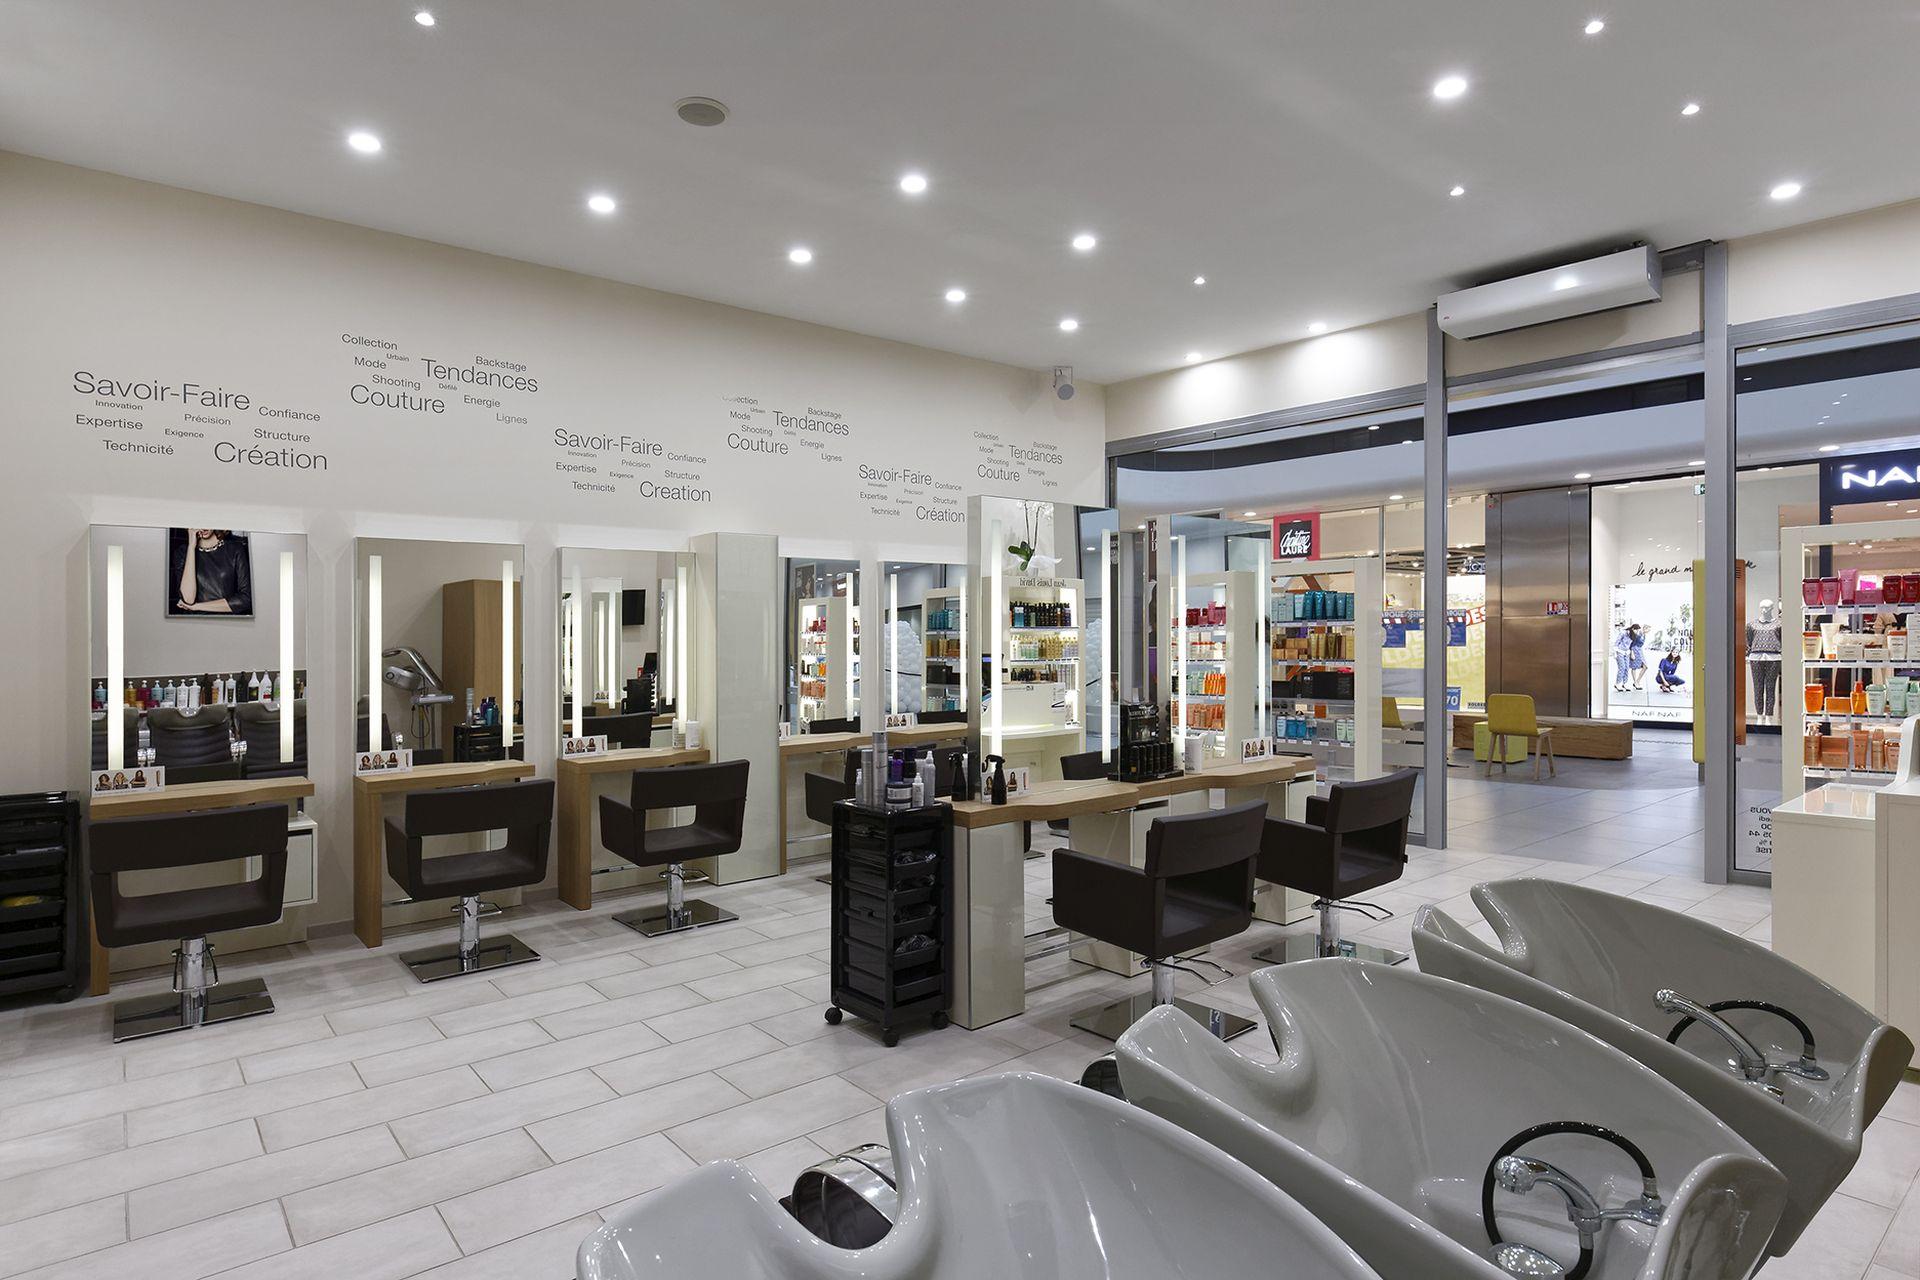 renovation-salon-coiffure-jean-louis-david-005